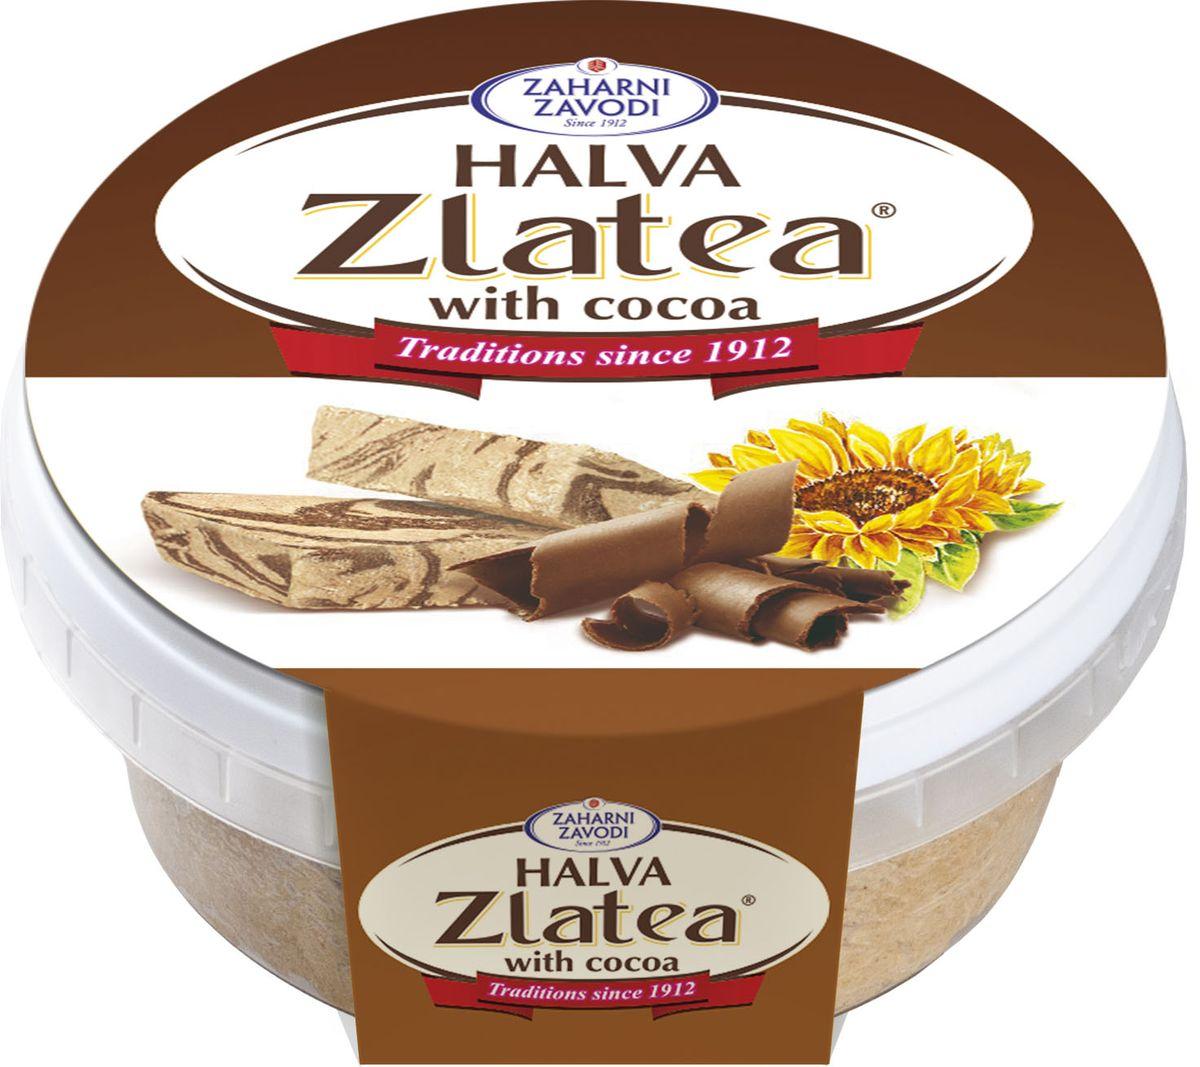 Zaharni Zavodi Zlatea Подсолнечная с какао халва, 280 г мааг халва подсолнечника 200 г